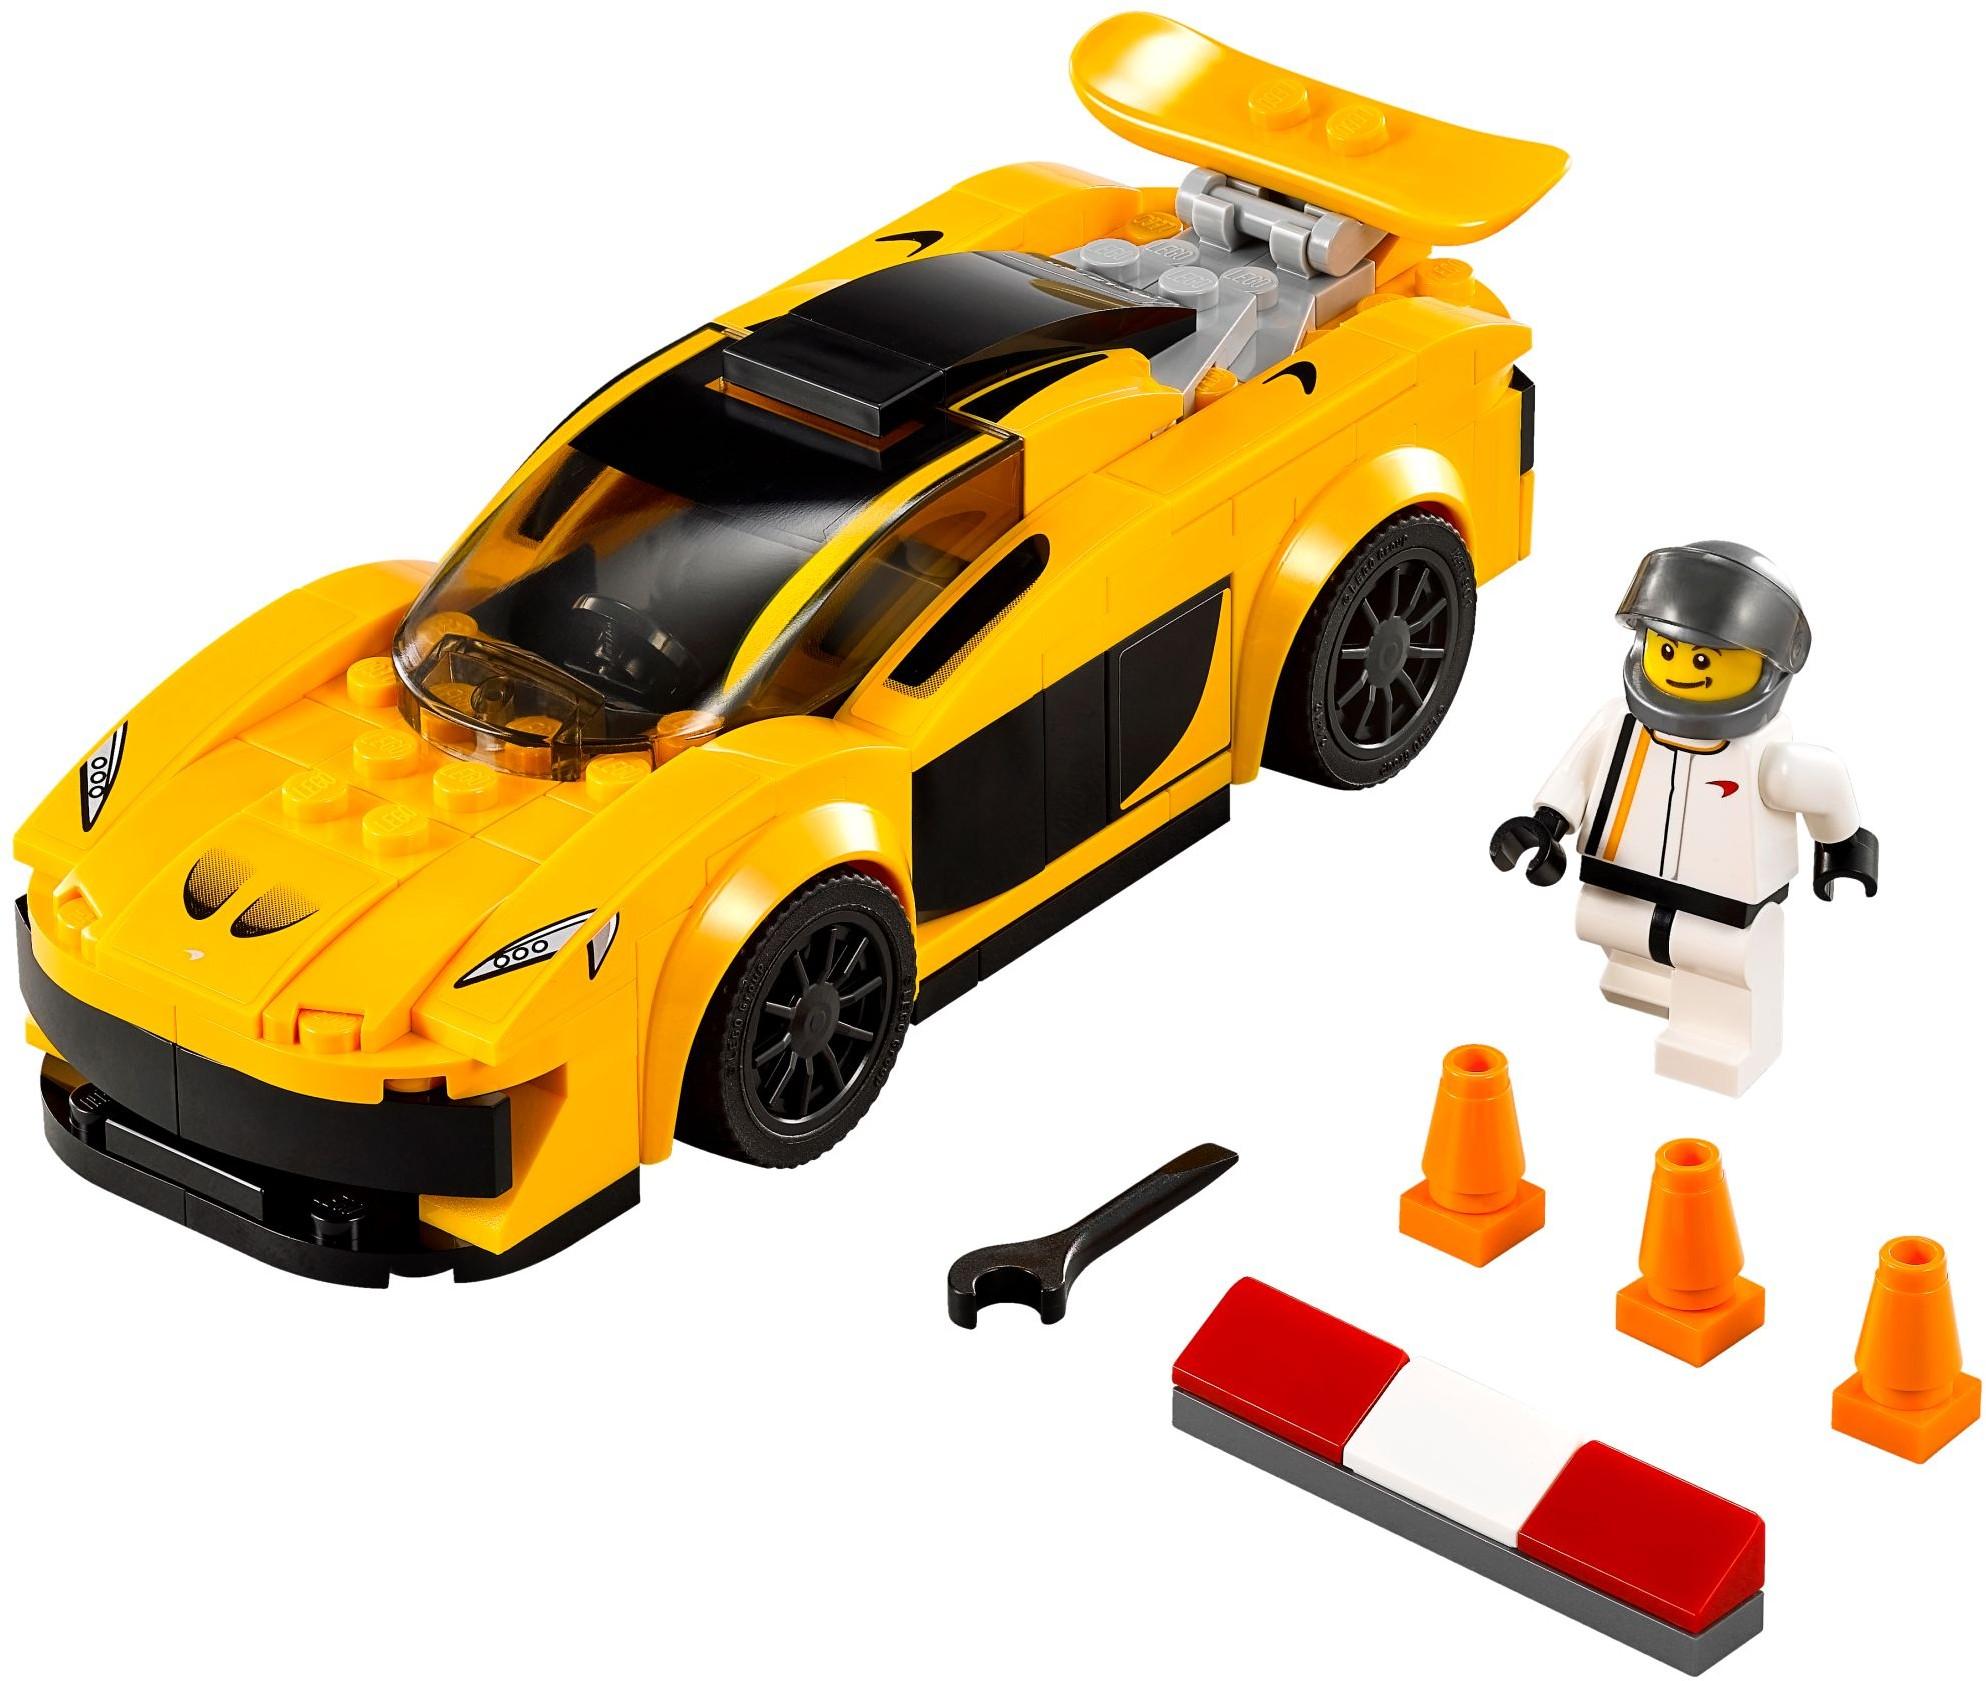 75909-1 Mesmerizing Porsche 918 Spyder Lego Review Cars Trend